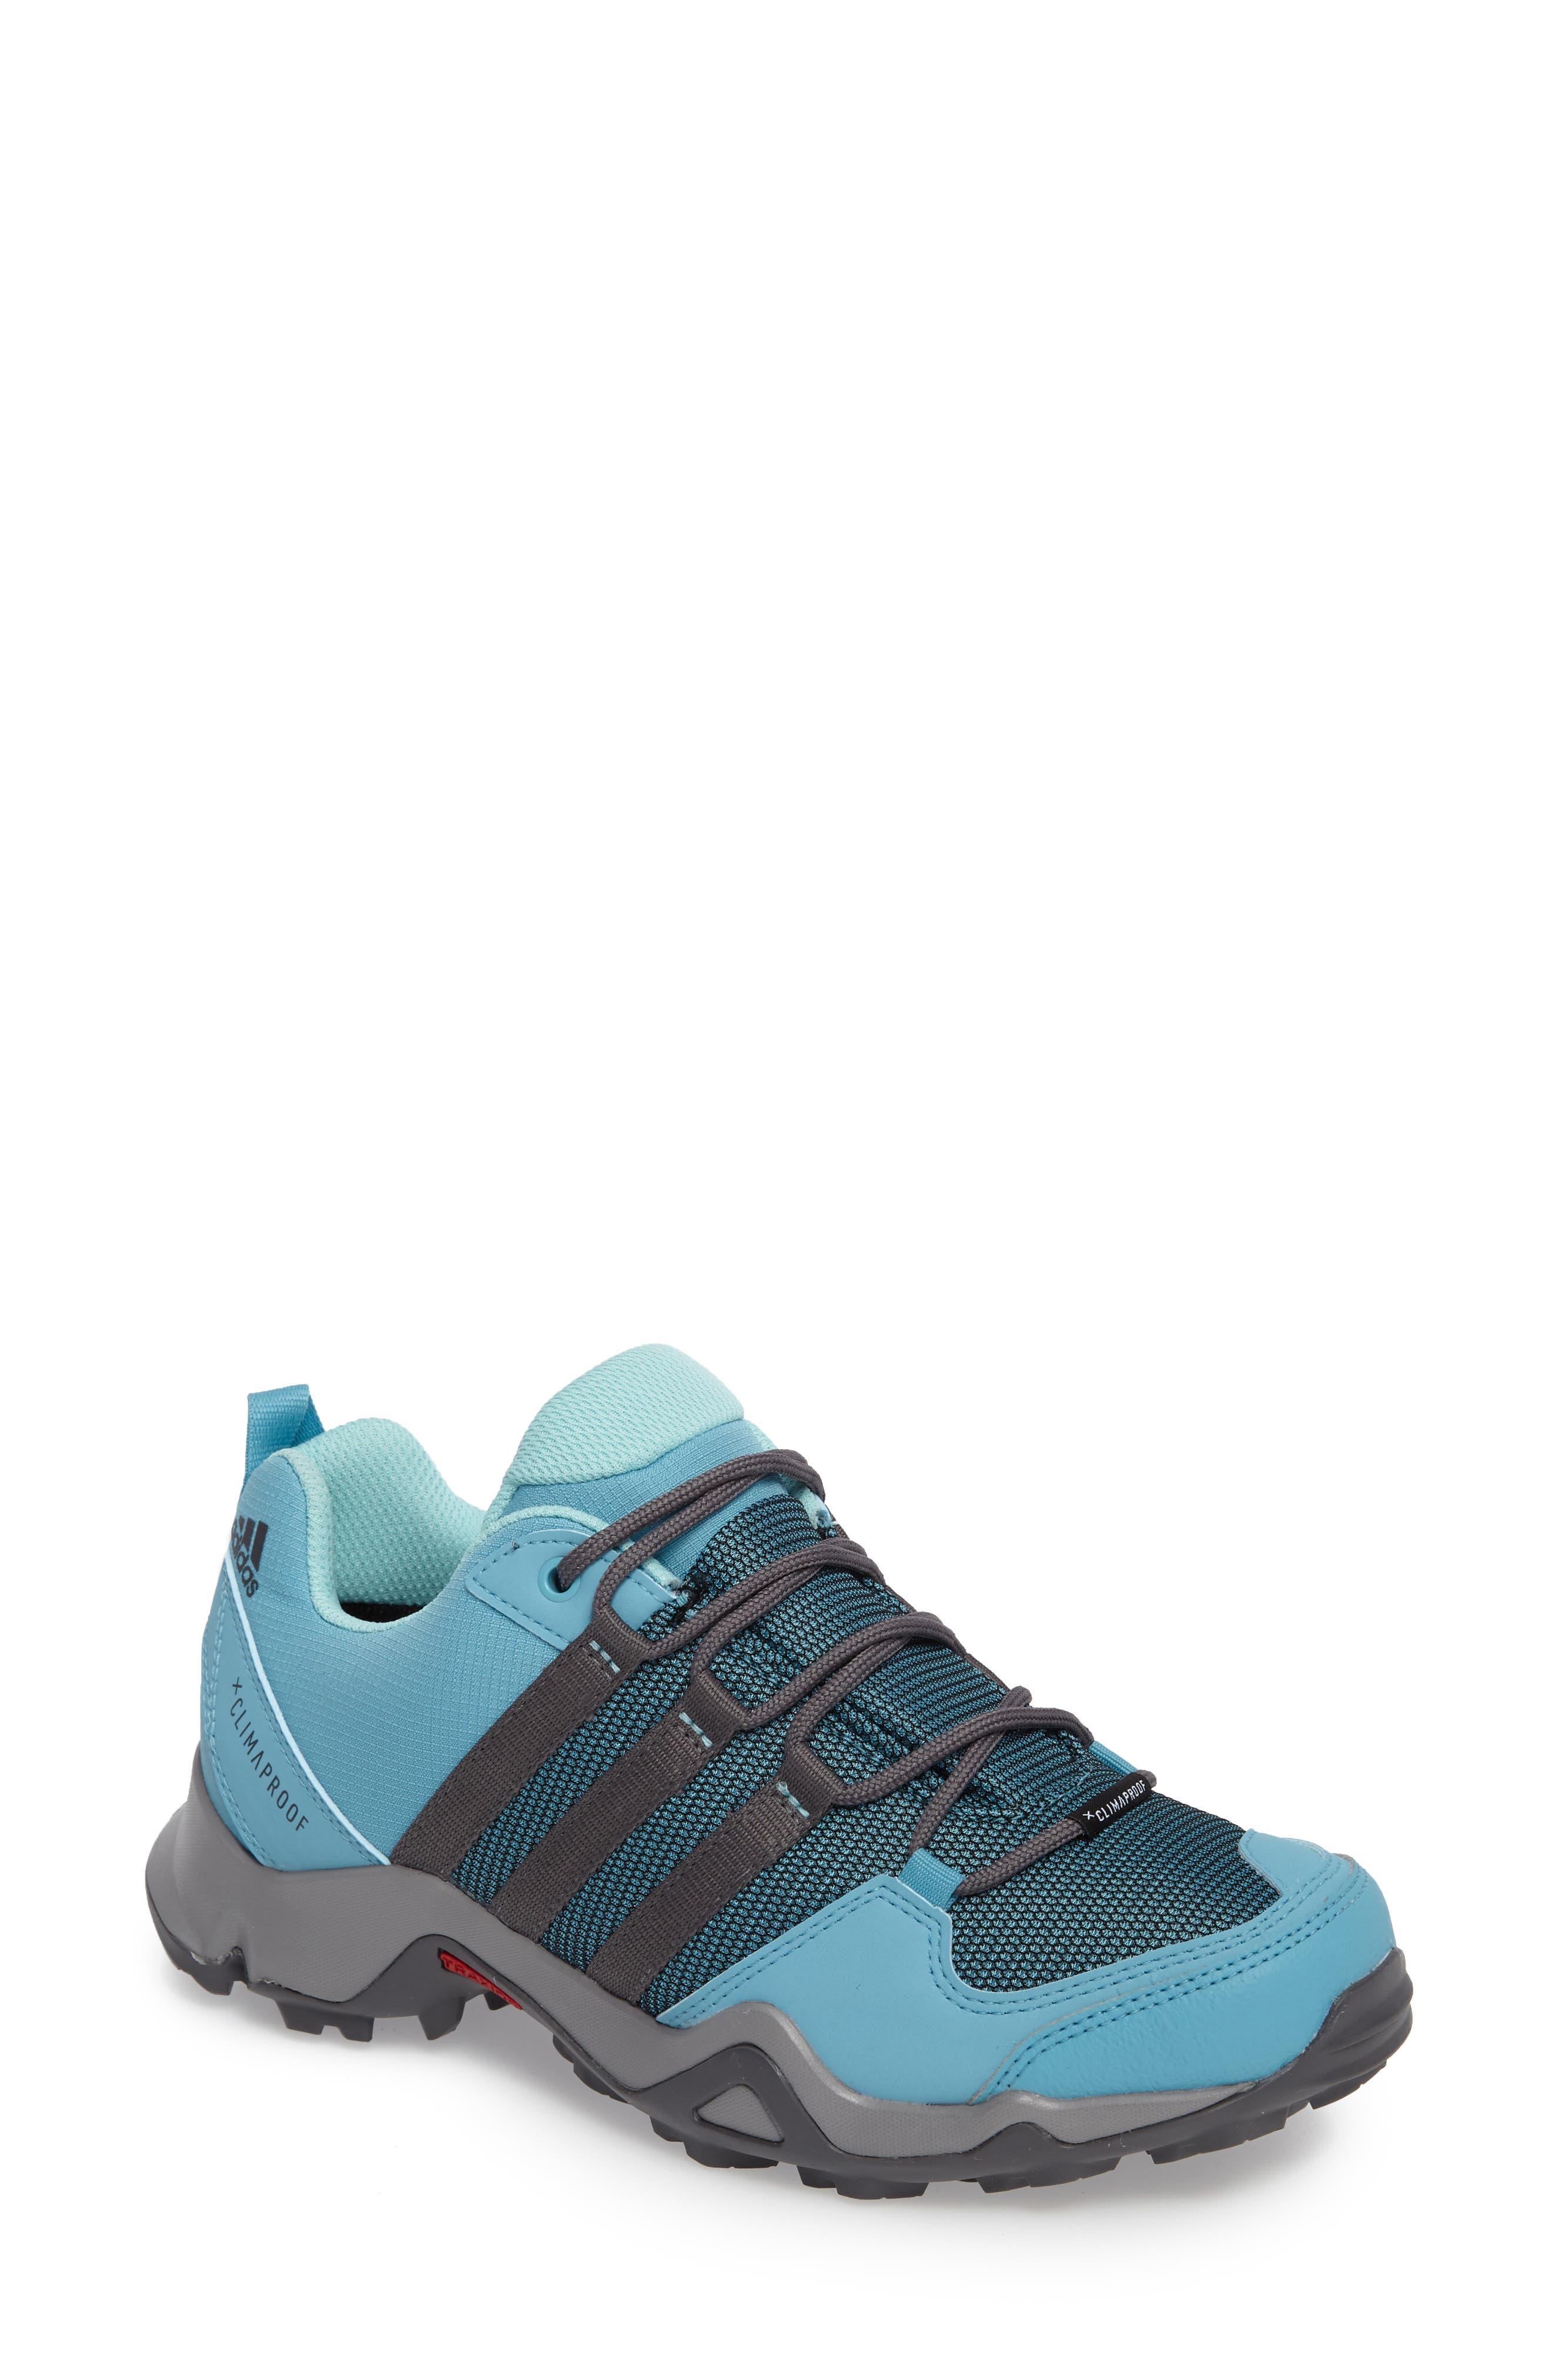 Alternate Image 1 Selected - adidas 'AX2' Waterproof Hiking Shoe (Women)